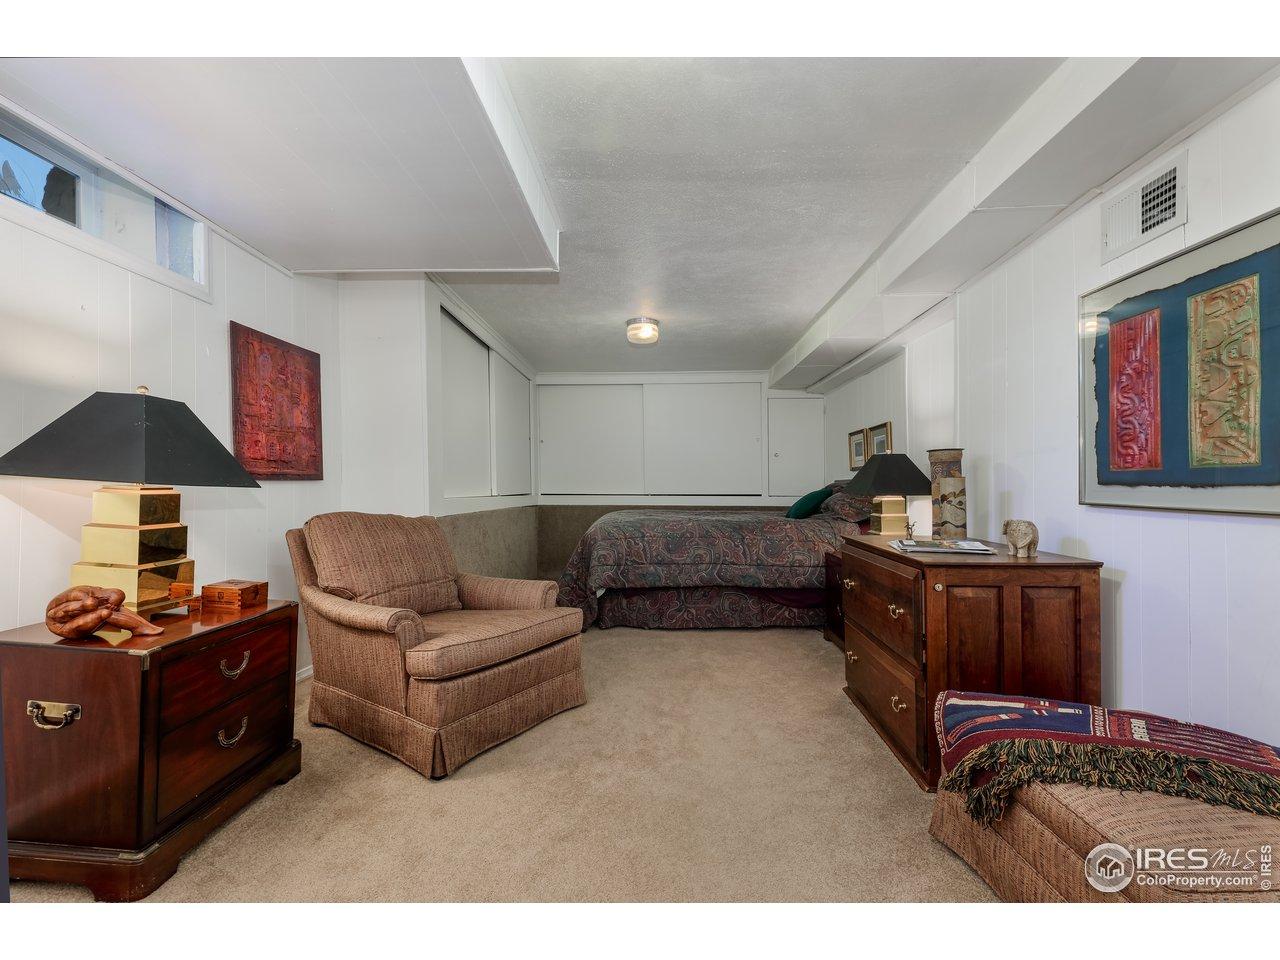 5th bedroom, basement